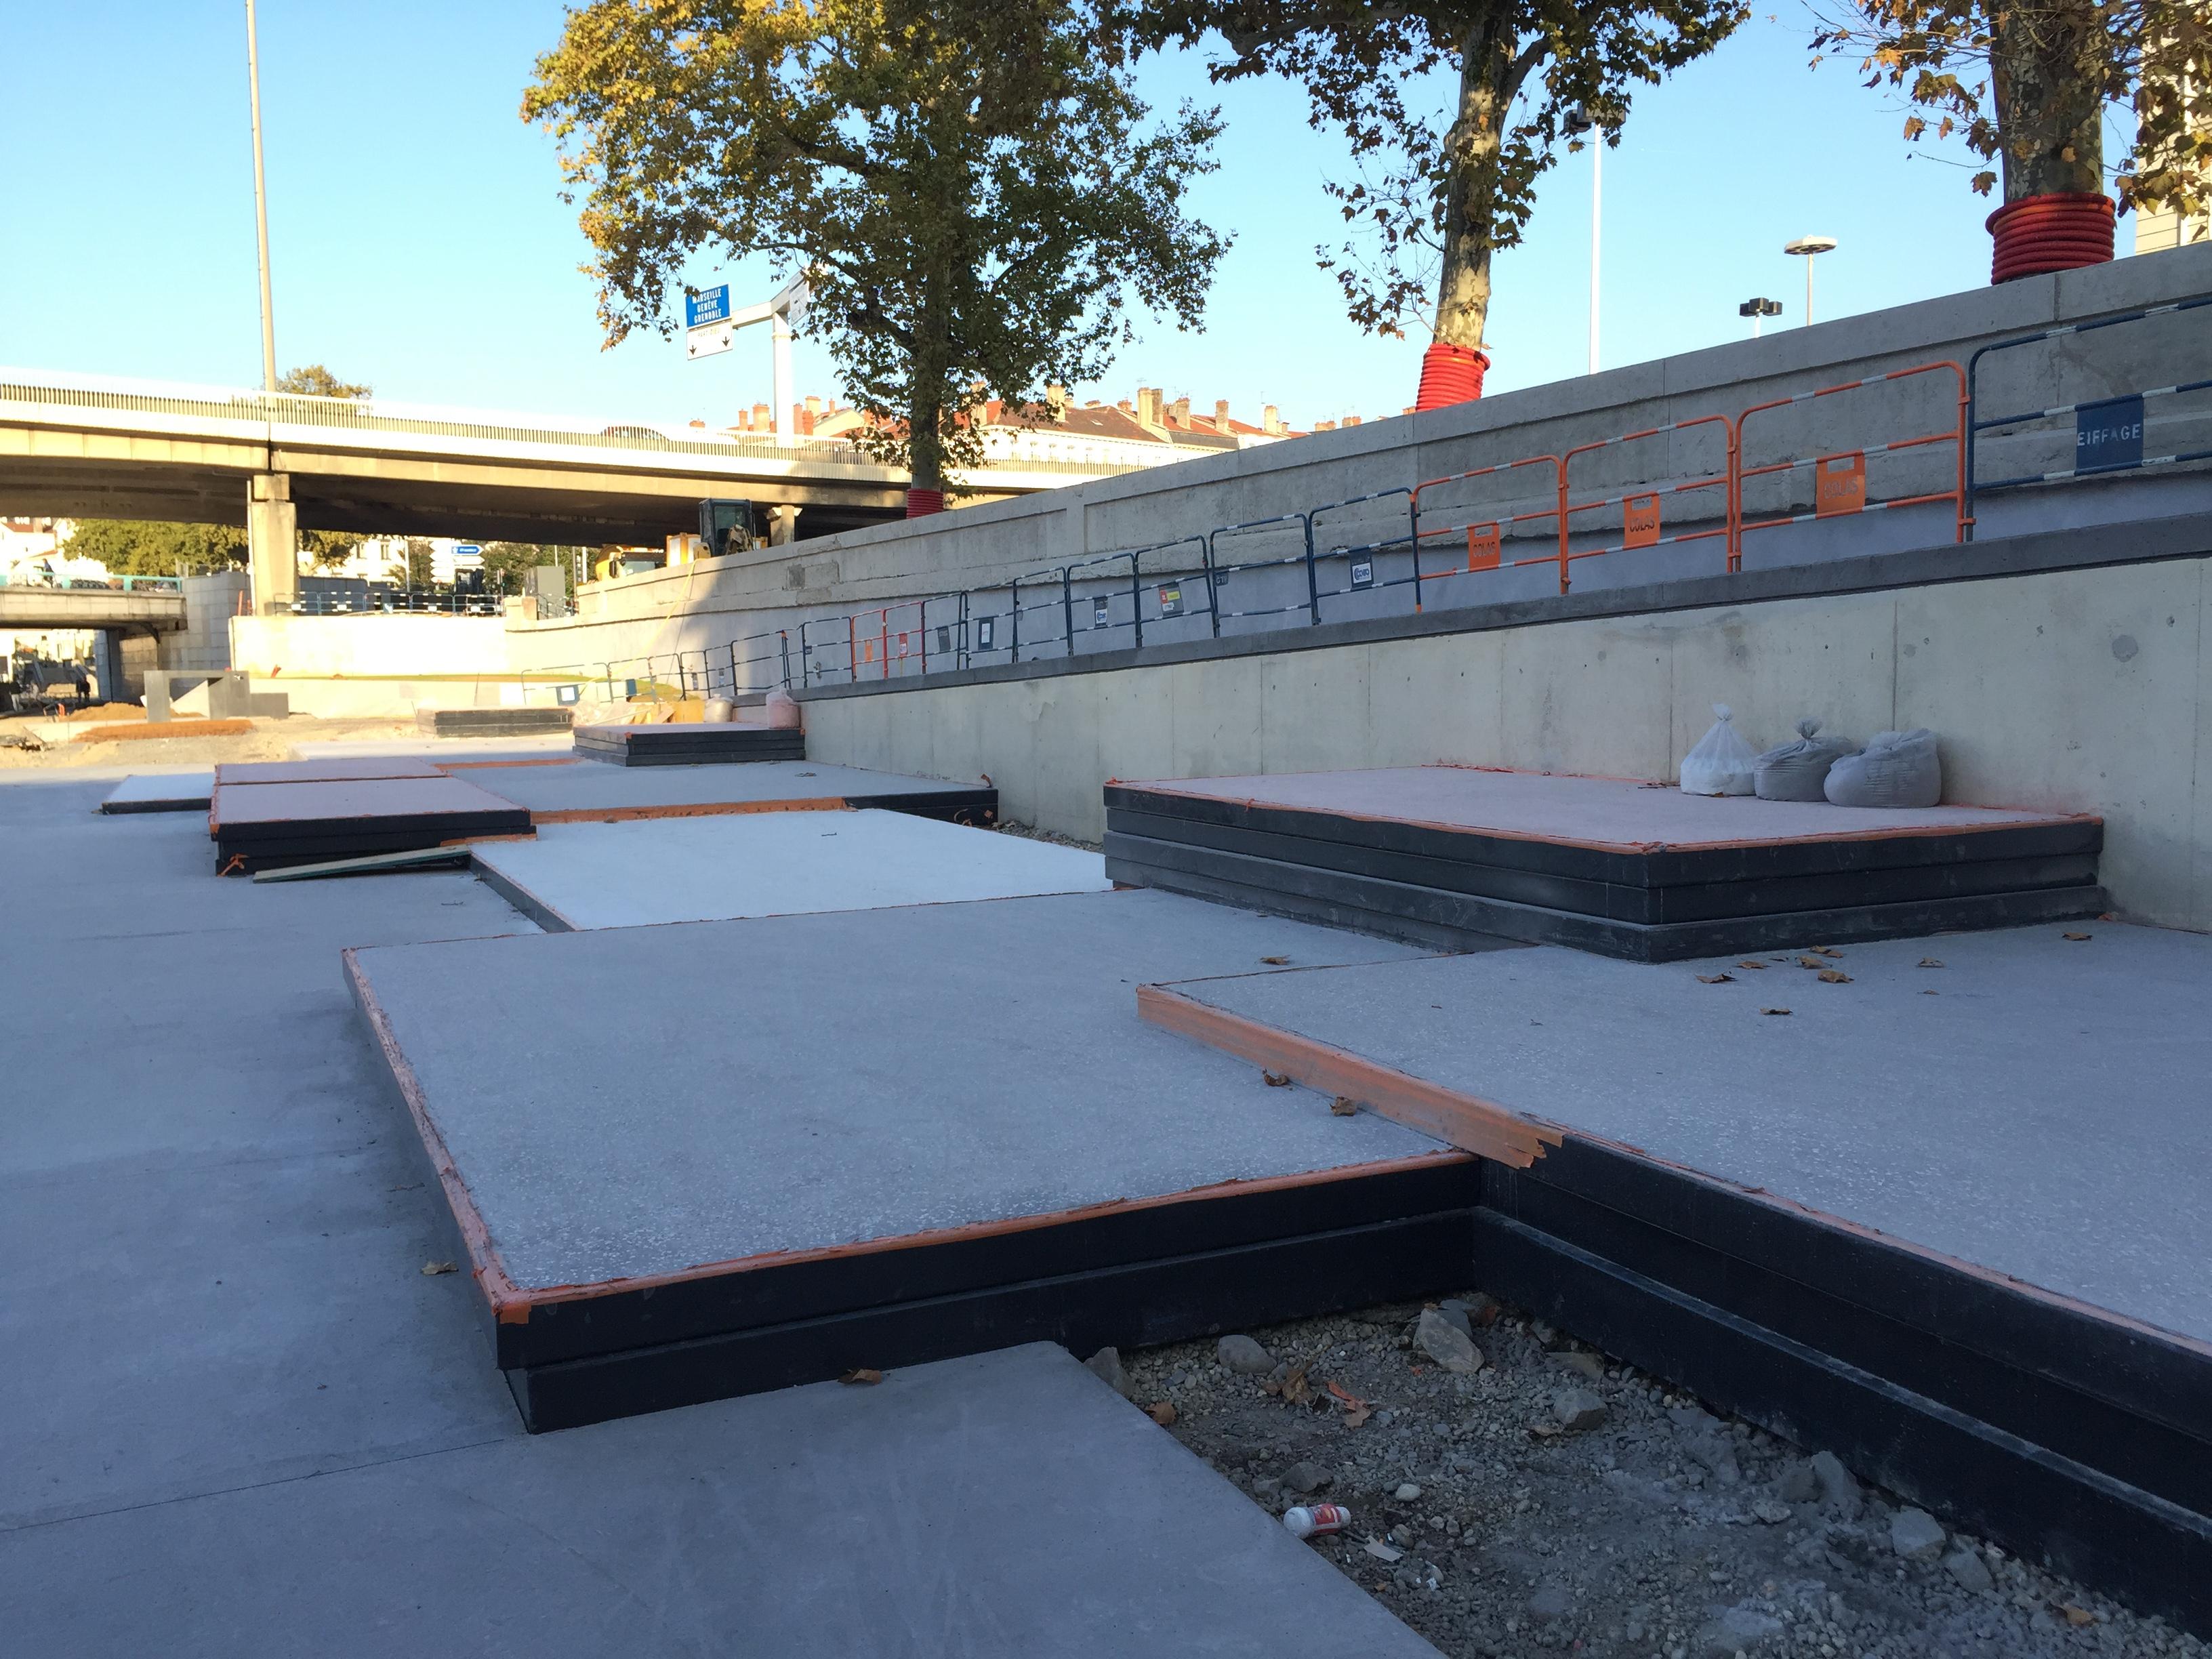 Skatepark Perrache Lyon